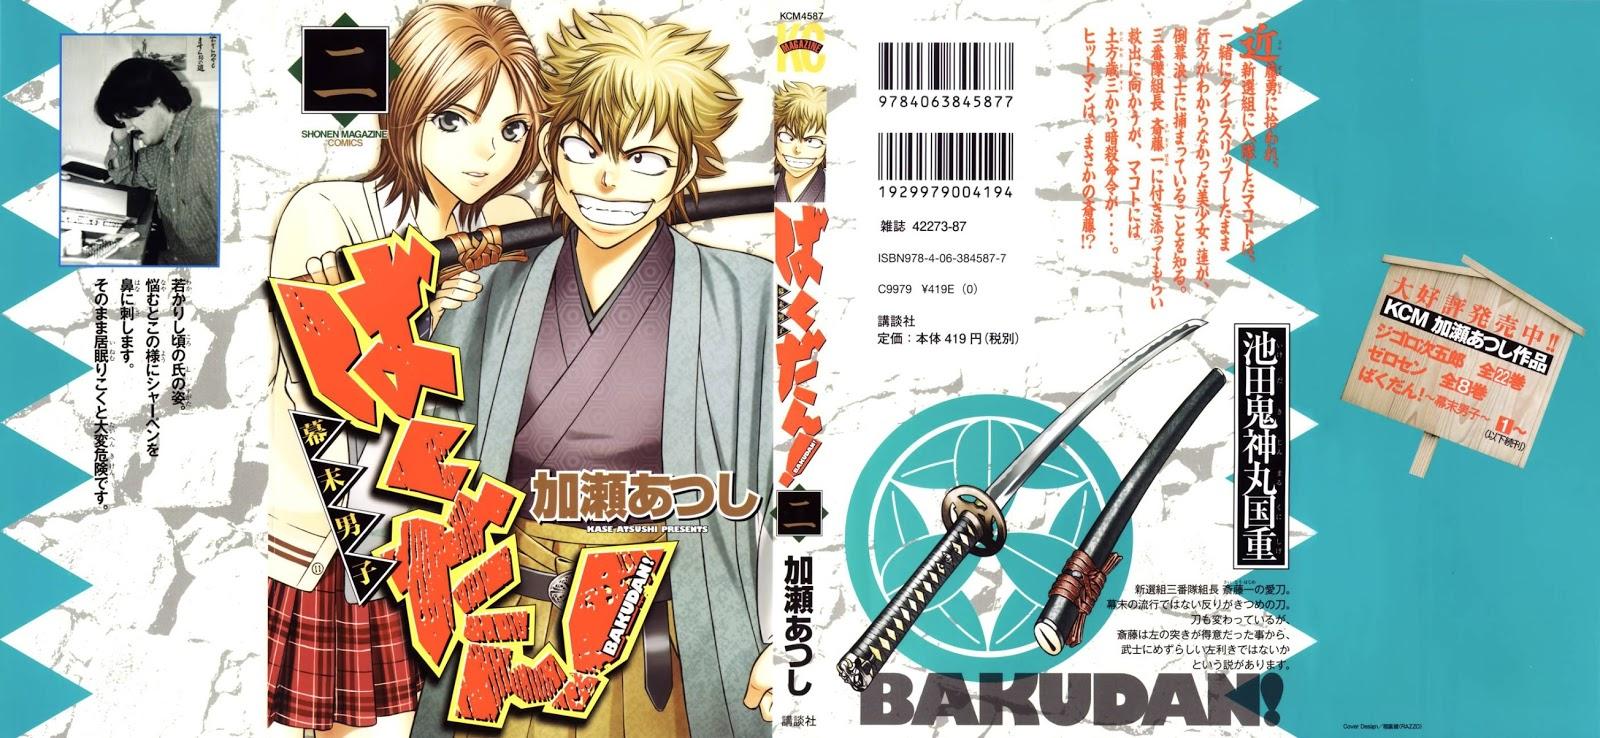 Bakudan! - Bakumatsu Danshi-ตอนที่ 7